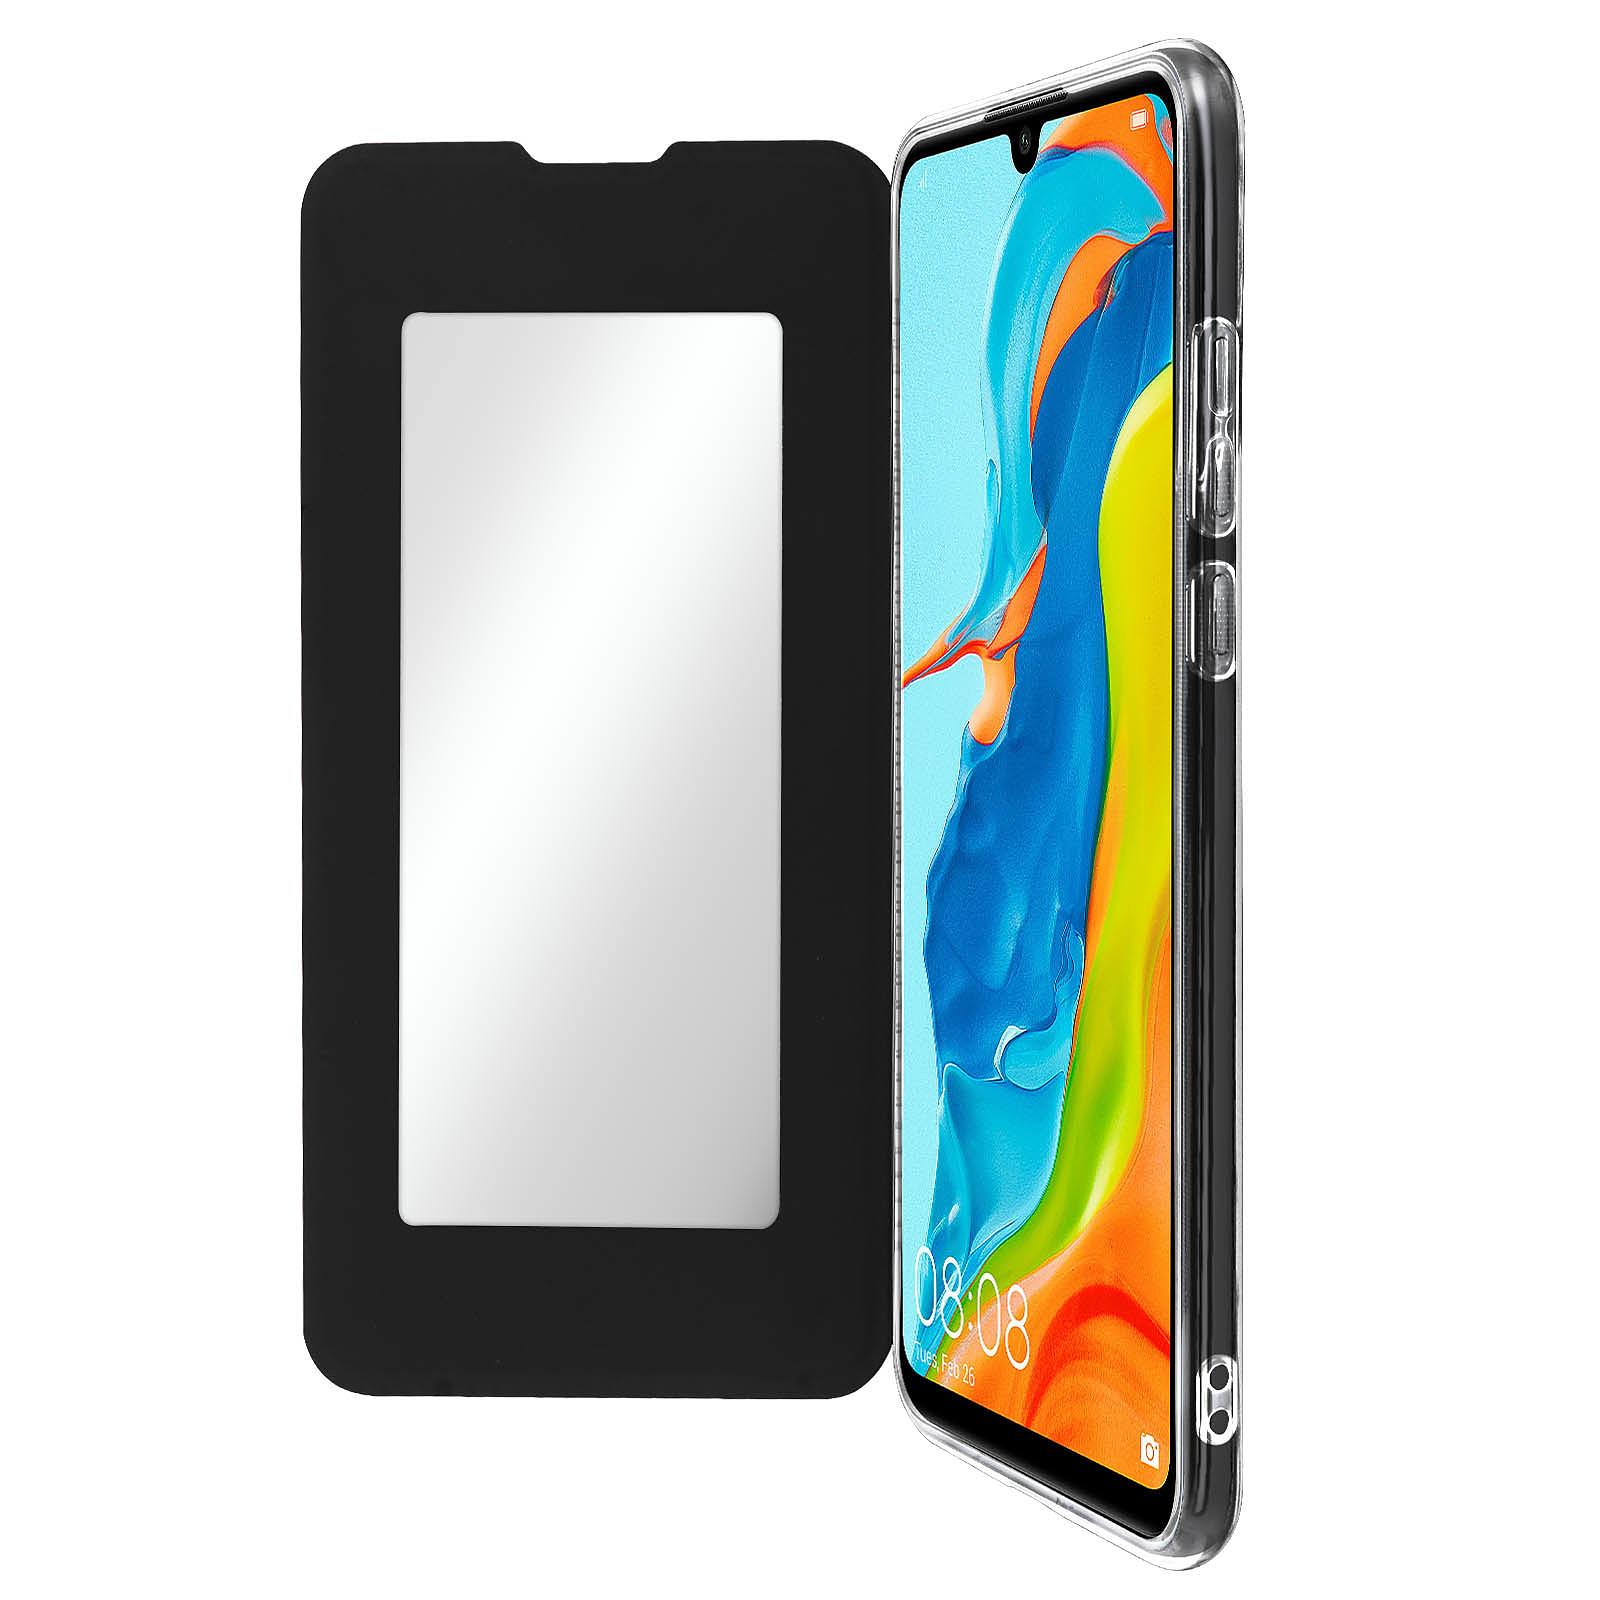 Avizar Etui folio Noir pour Huawei P30 Lite , Honor 20S , Huawei P30 Lite XL